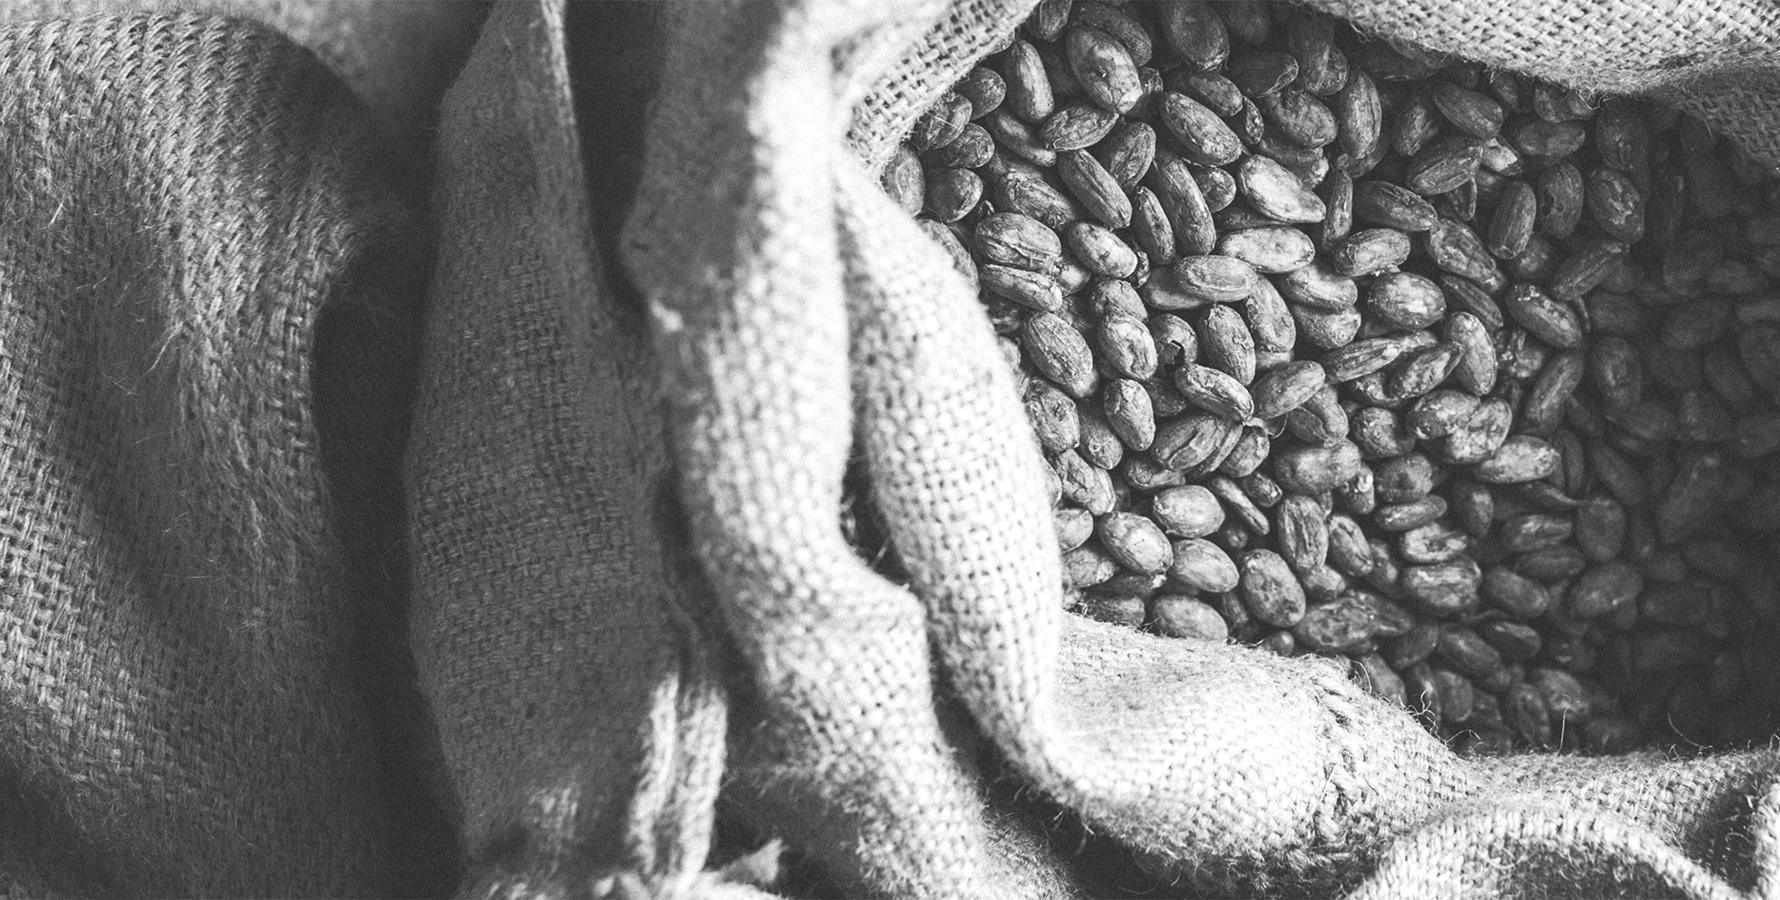 Bean-to-bar Laia chocolate maker bask country bayonne chocolate